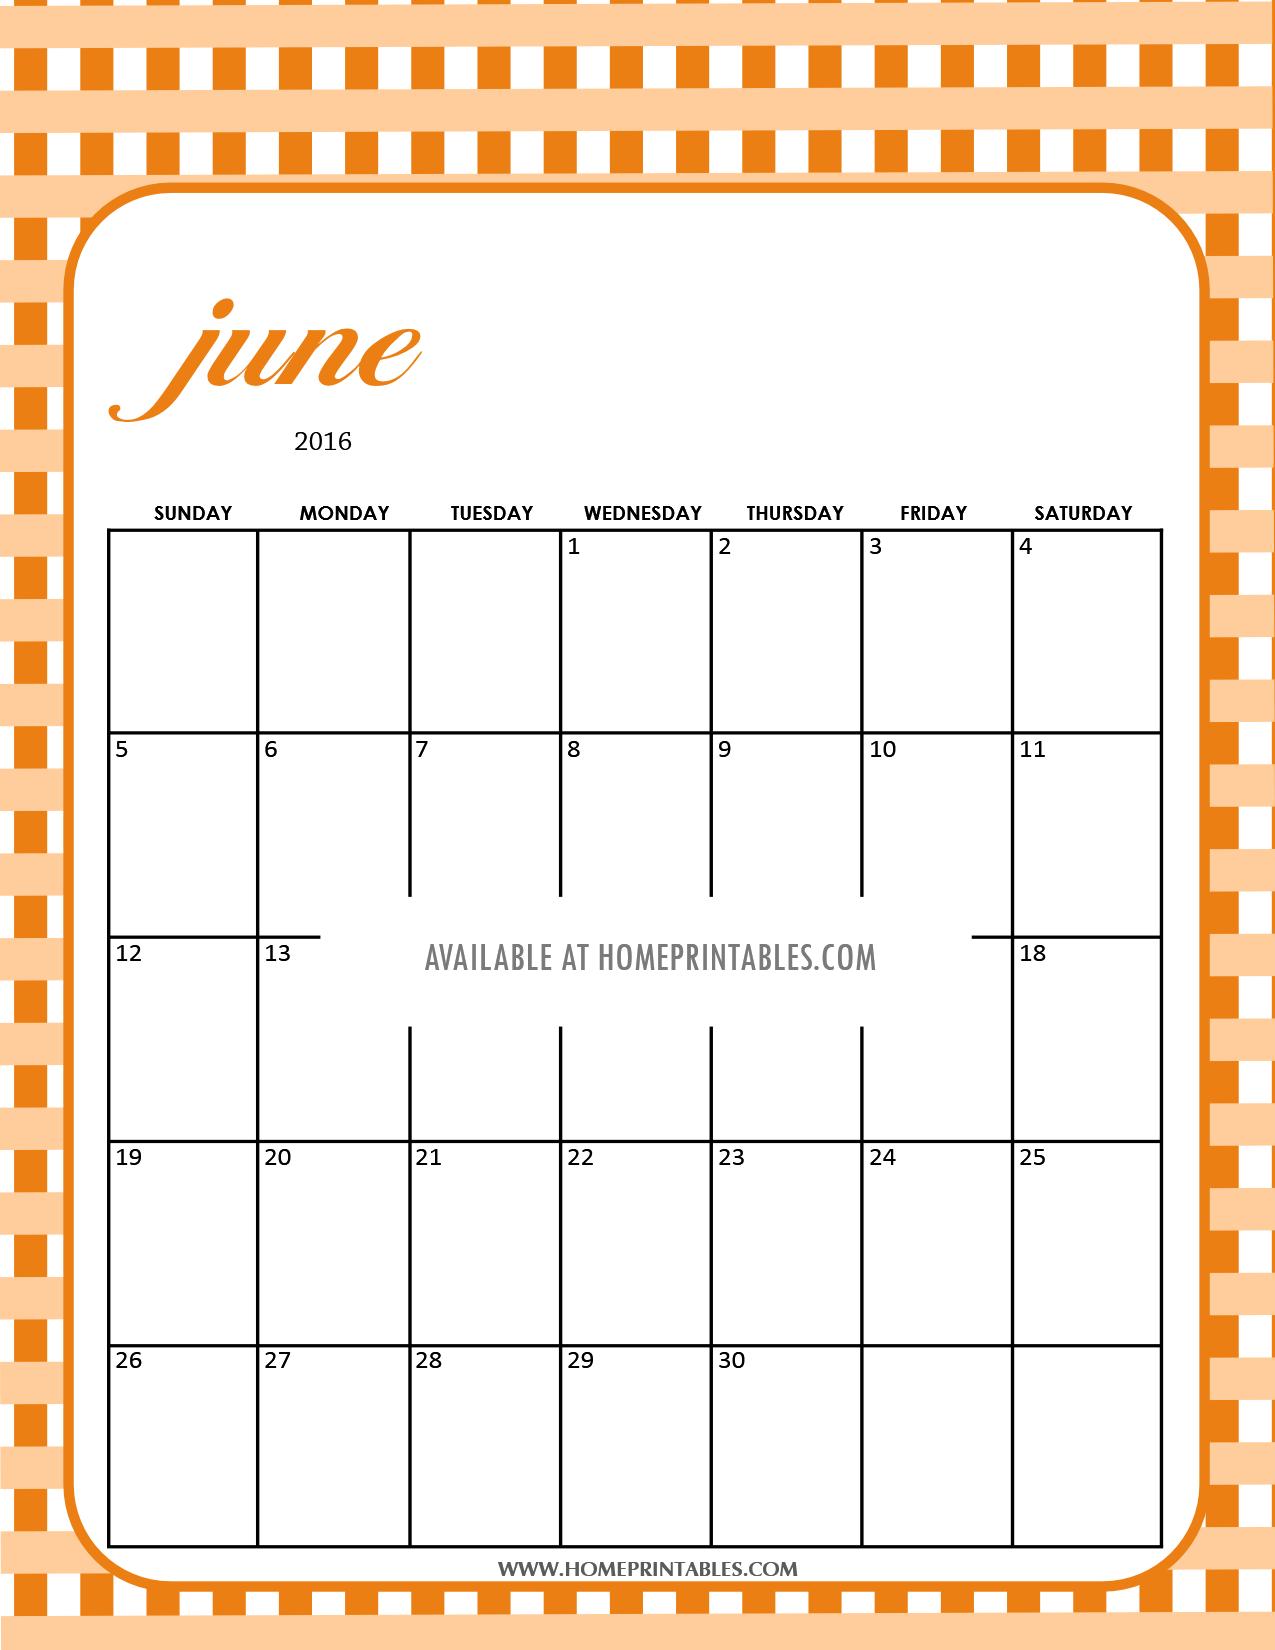 free printable June 2016 calendar plaid background